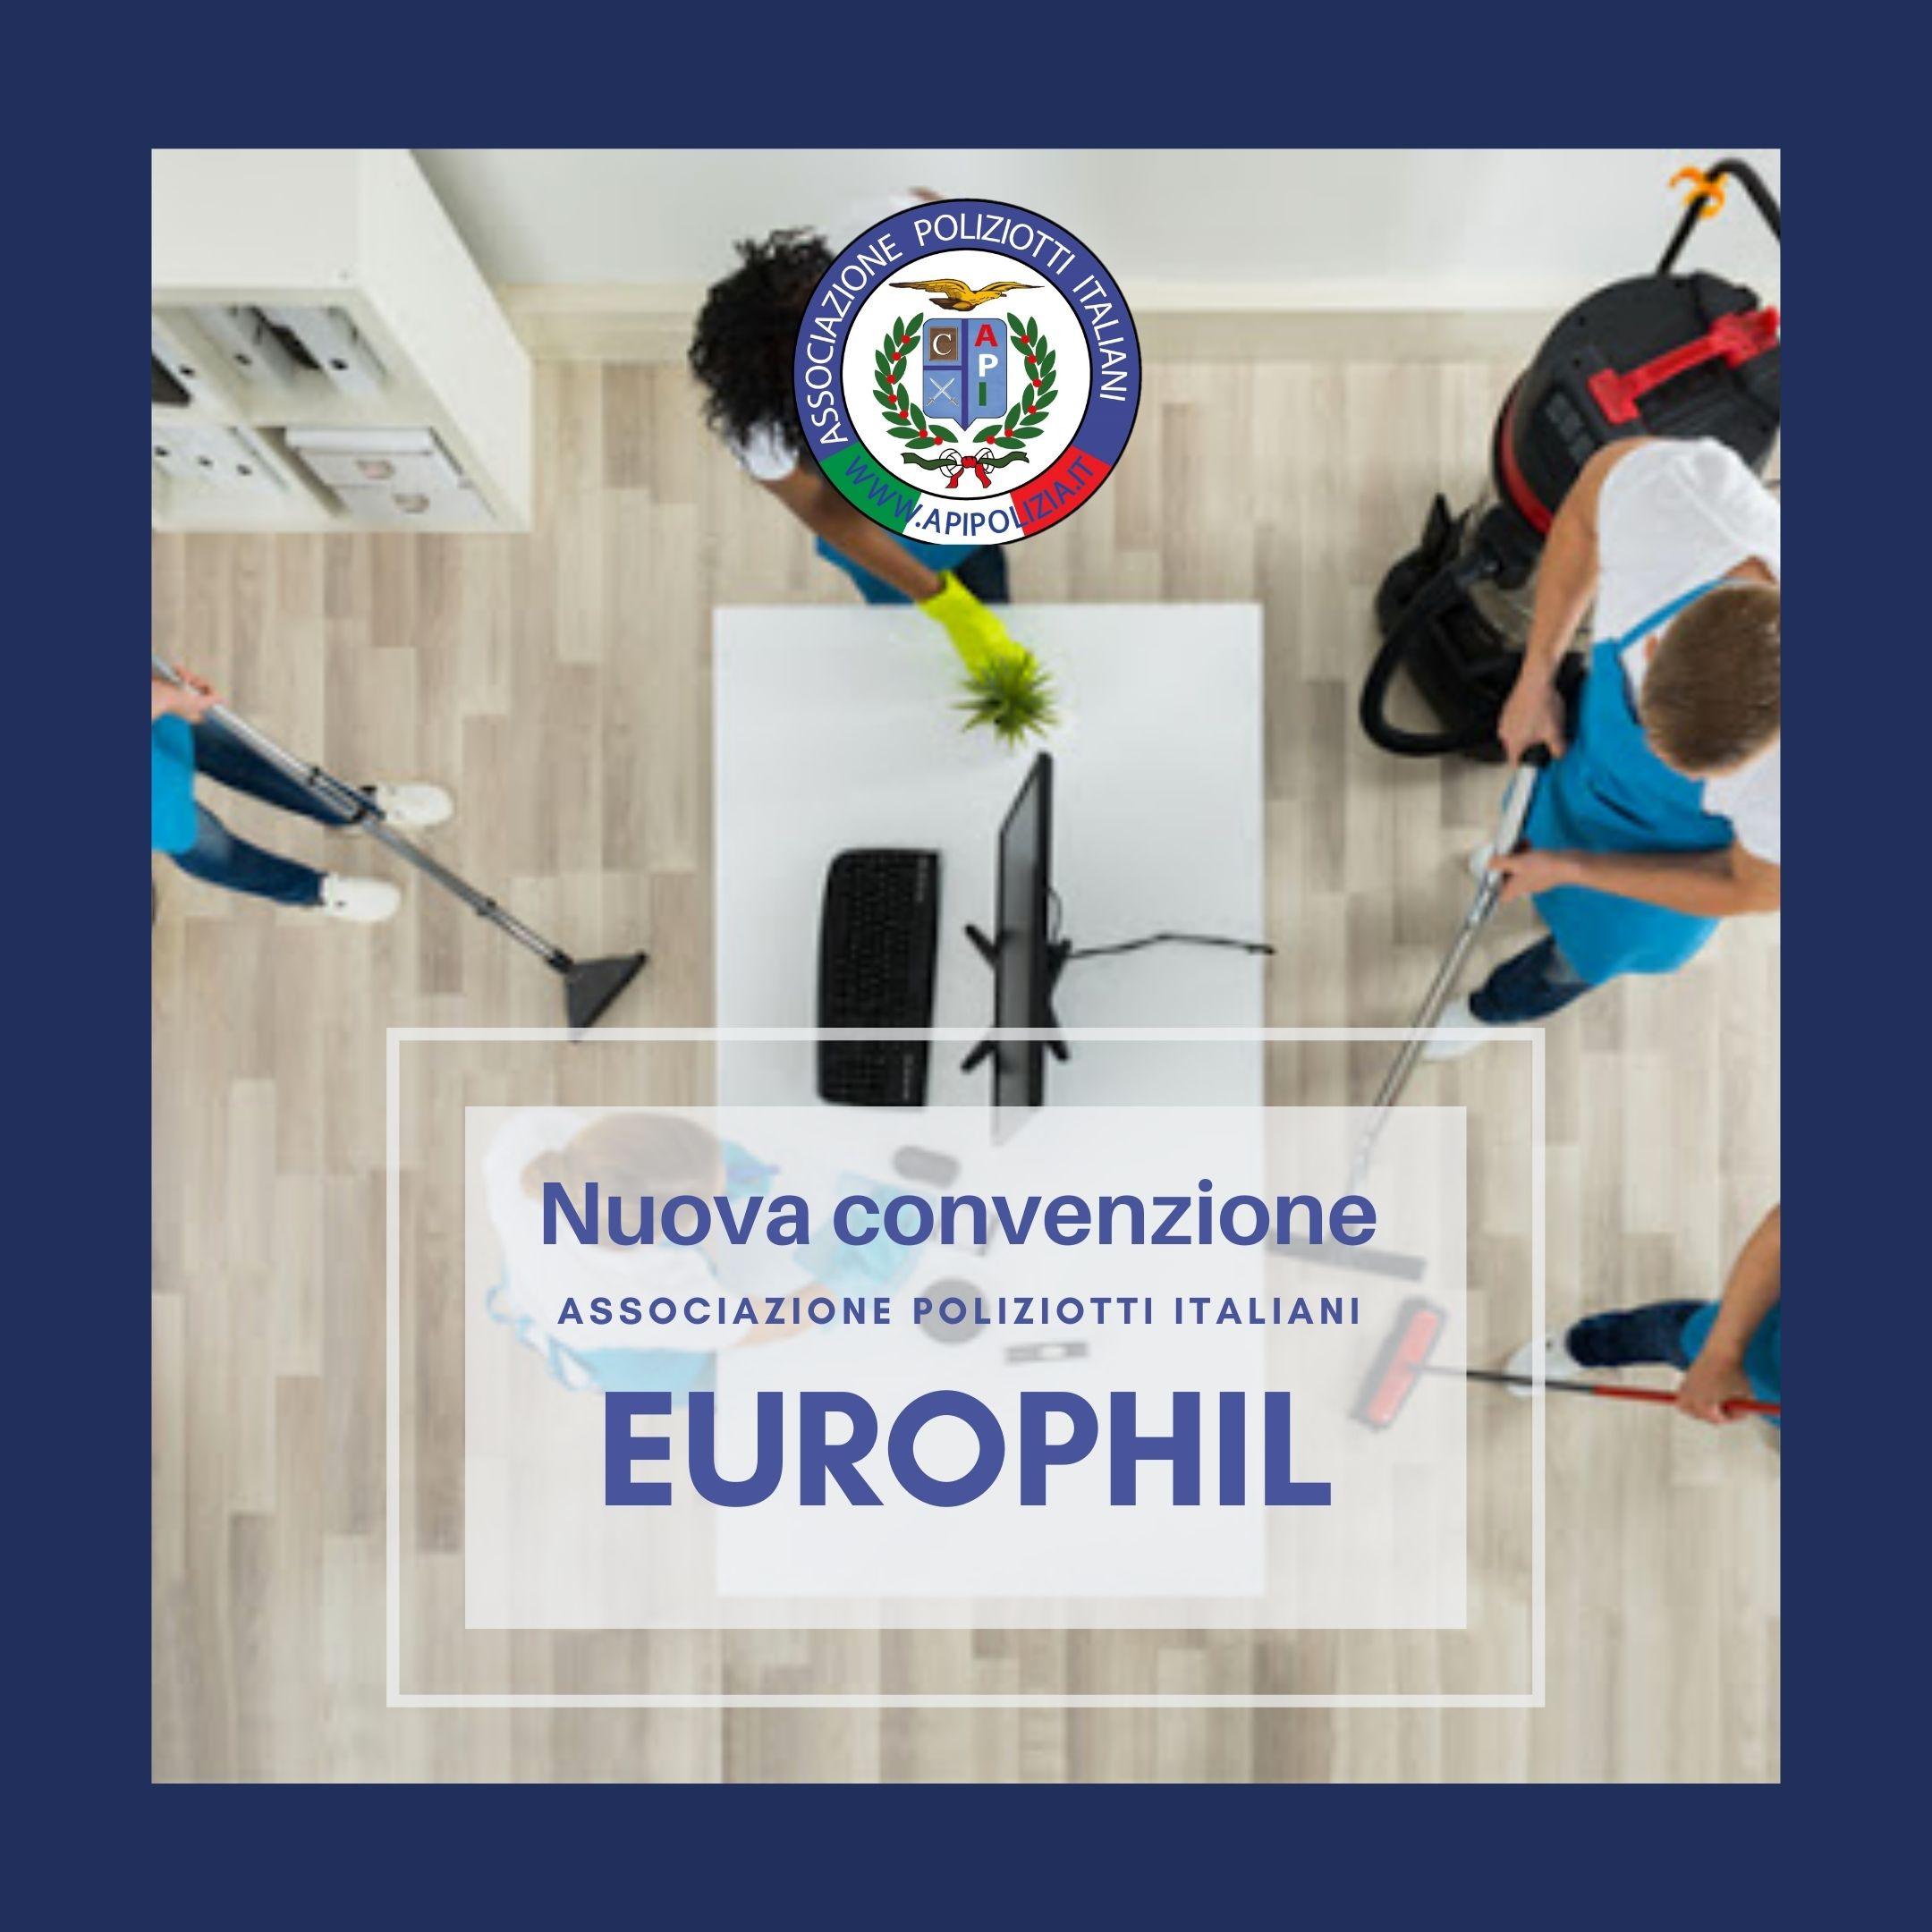 convenzione associazione poliziotti italiani impresa pulizie